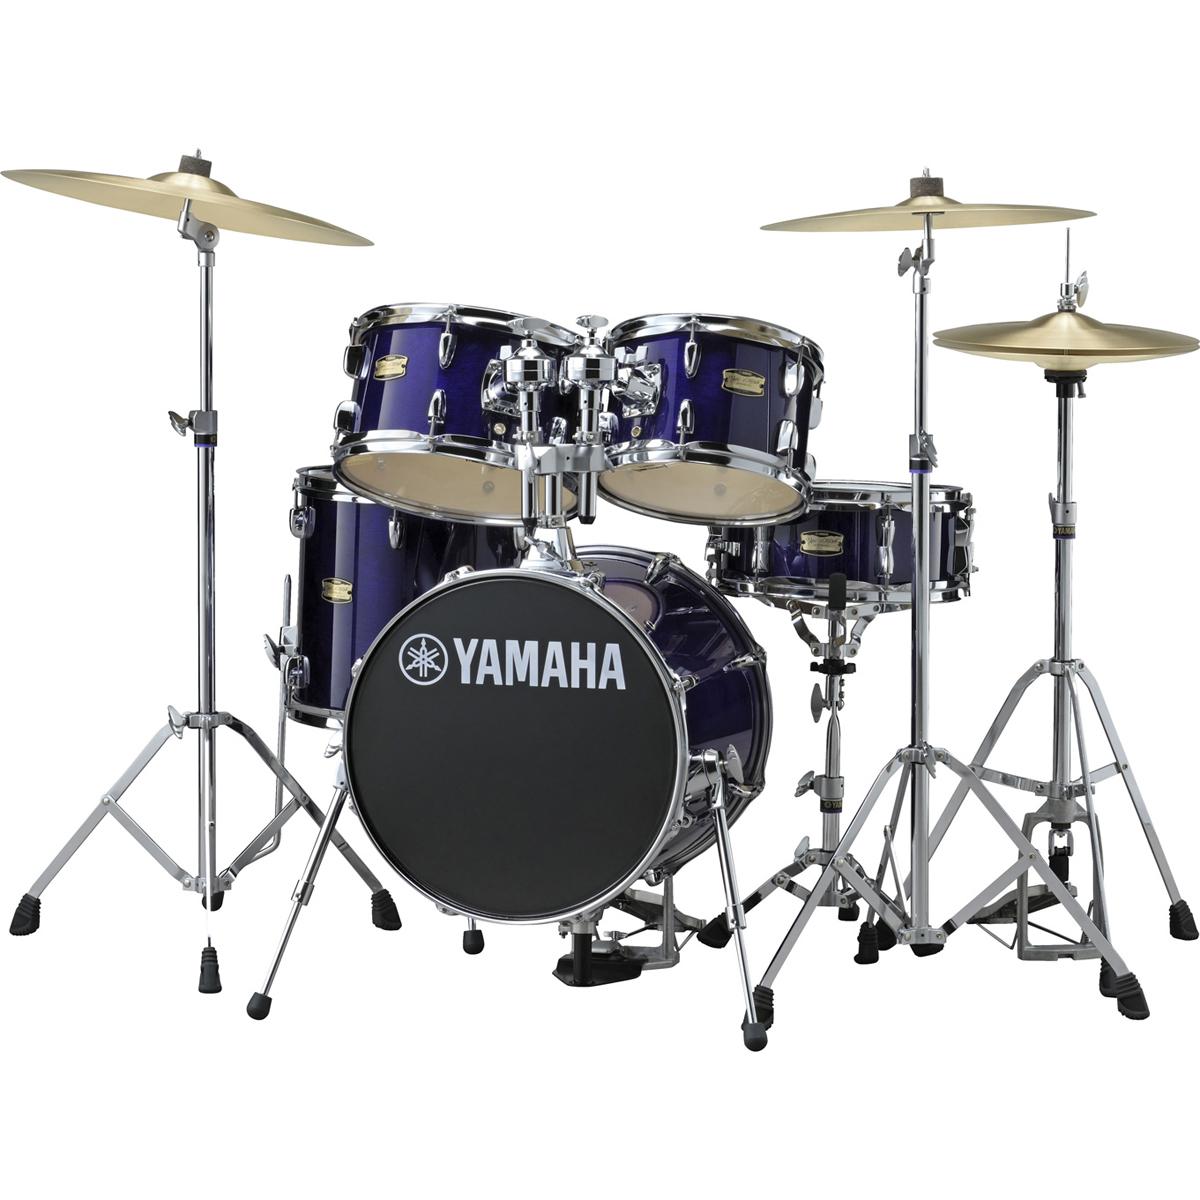 YAMAHA マヌ・カチェ シグネチャー Junior Kit ジュニアキット ドラムセット レーベンブラック